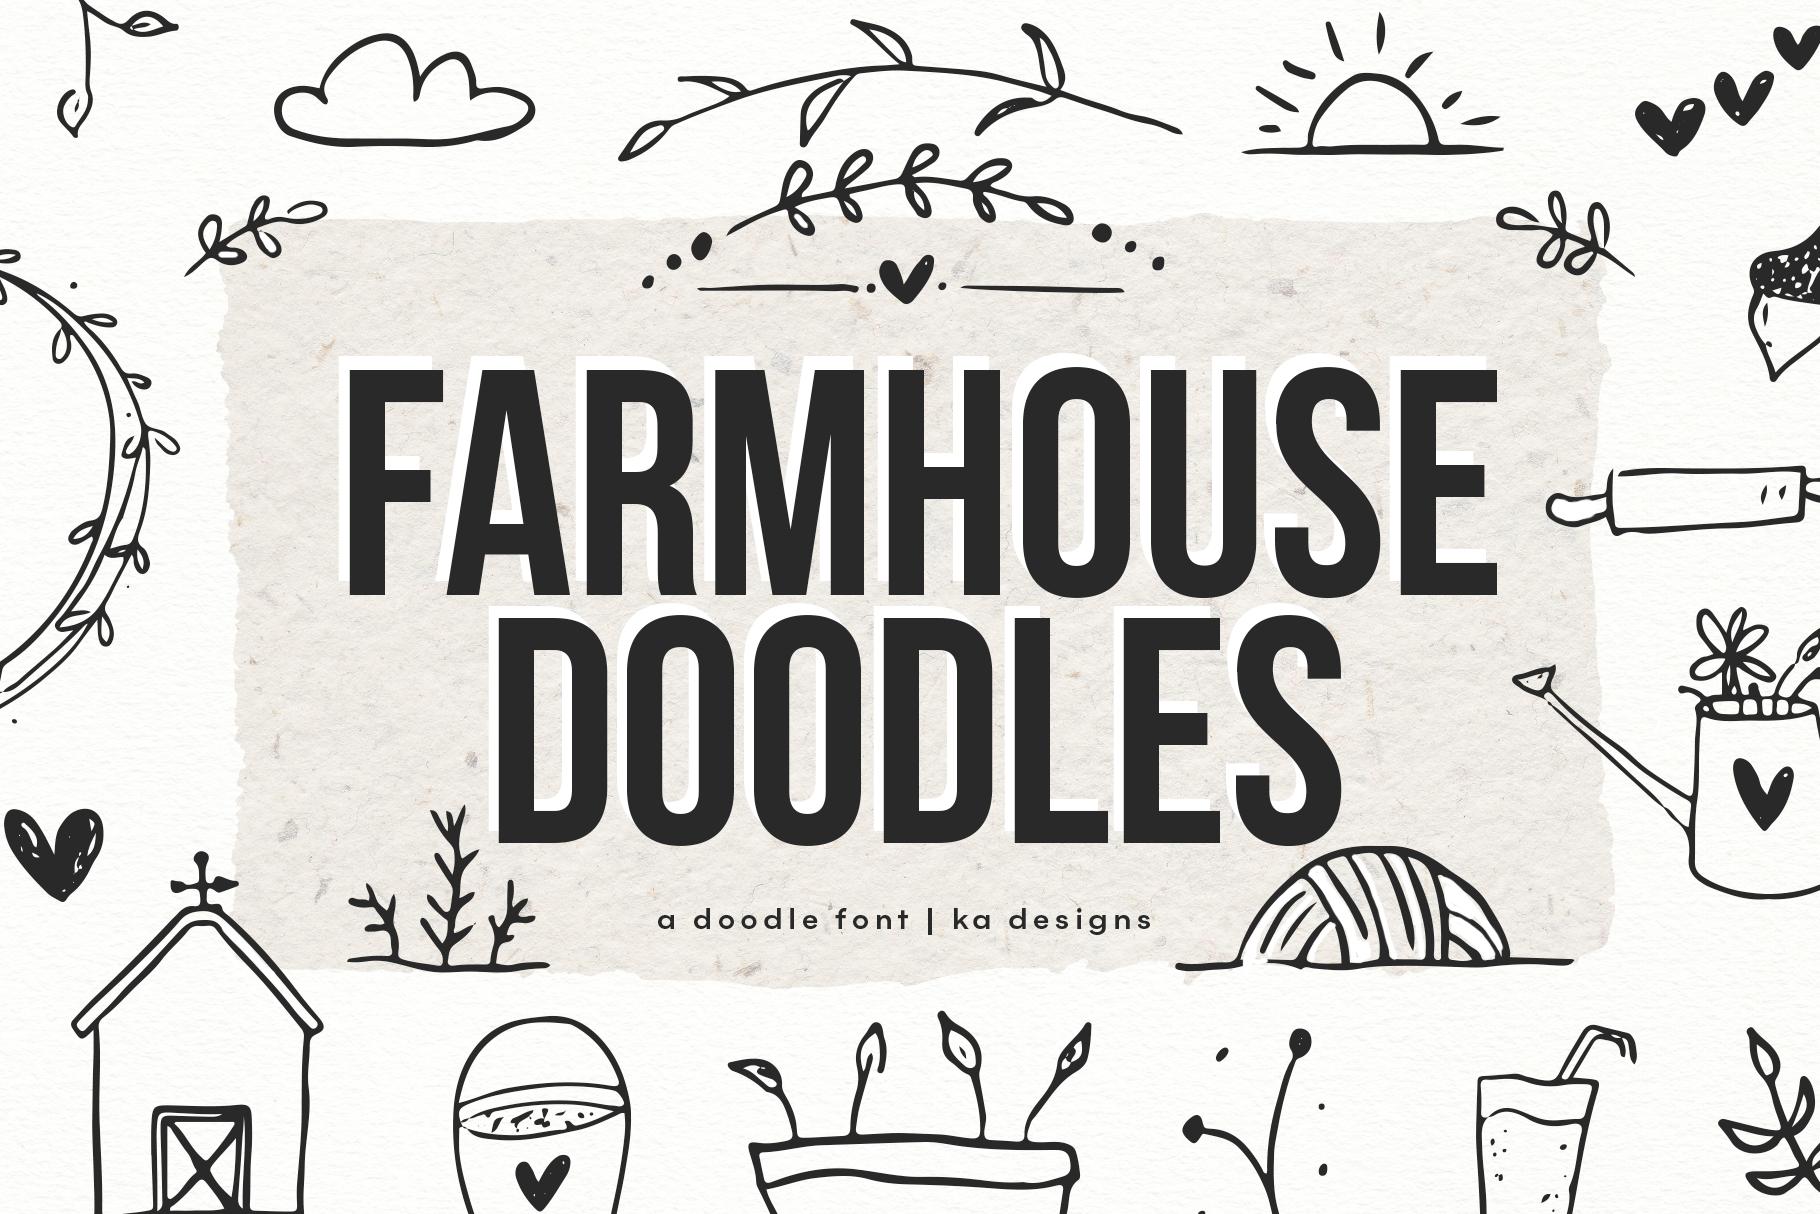 Farmhouse Doodles - Dingbat Font example image 1